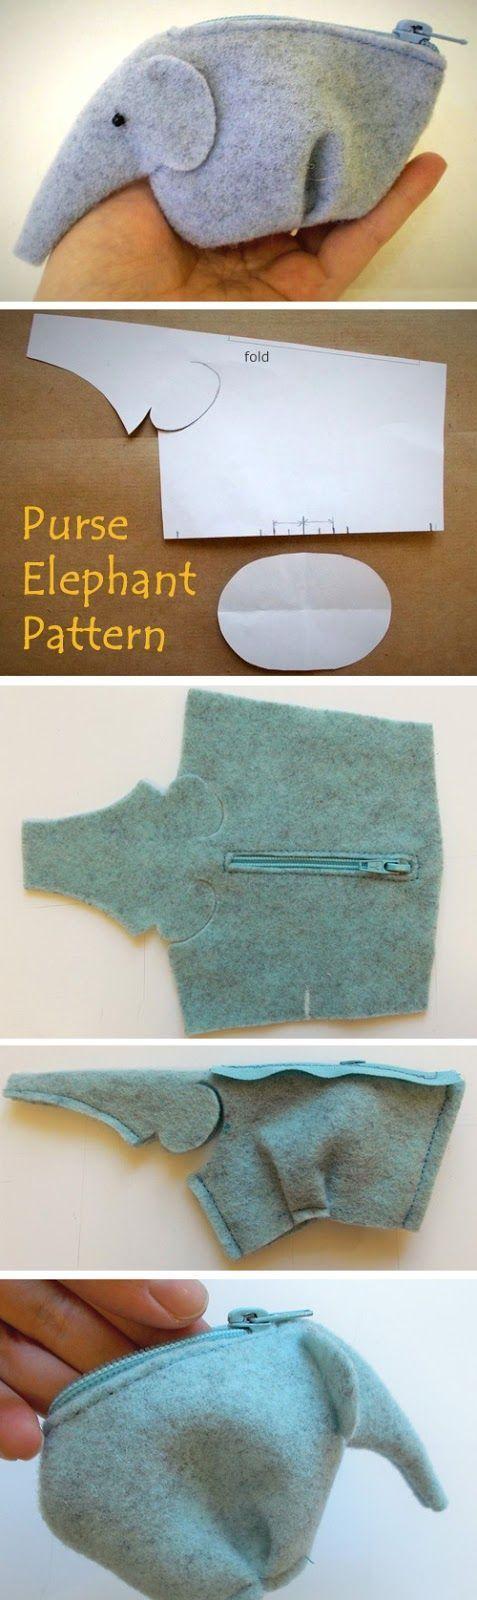 Geldbeutel-Elefant-Tutorial - schmuckselbermachen9.tk | Schmuck Diy #sewingprojects